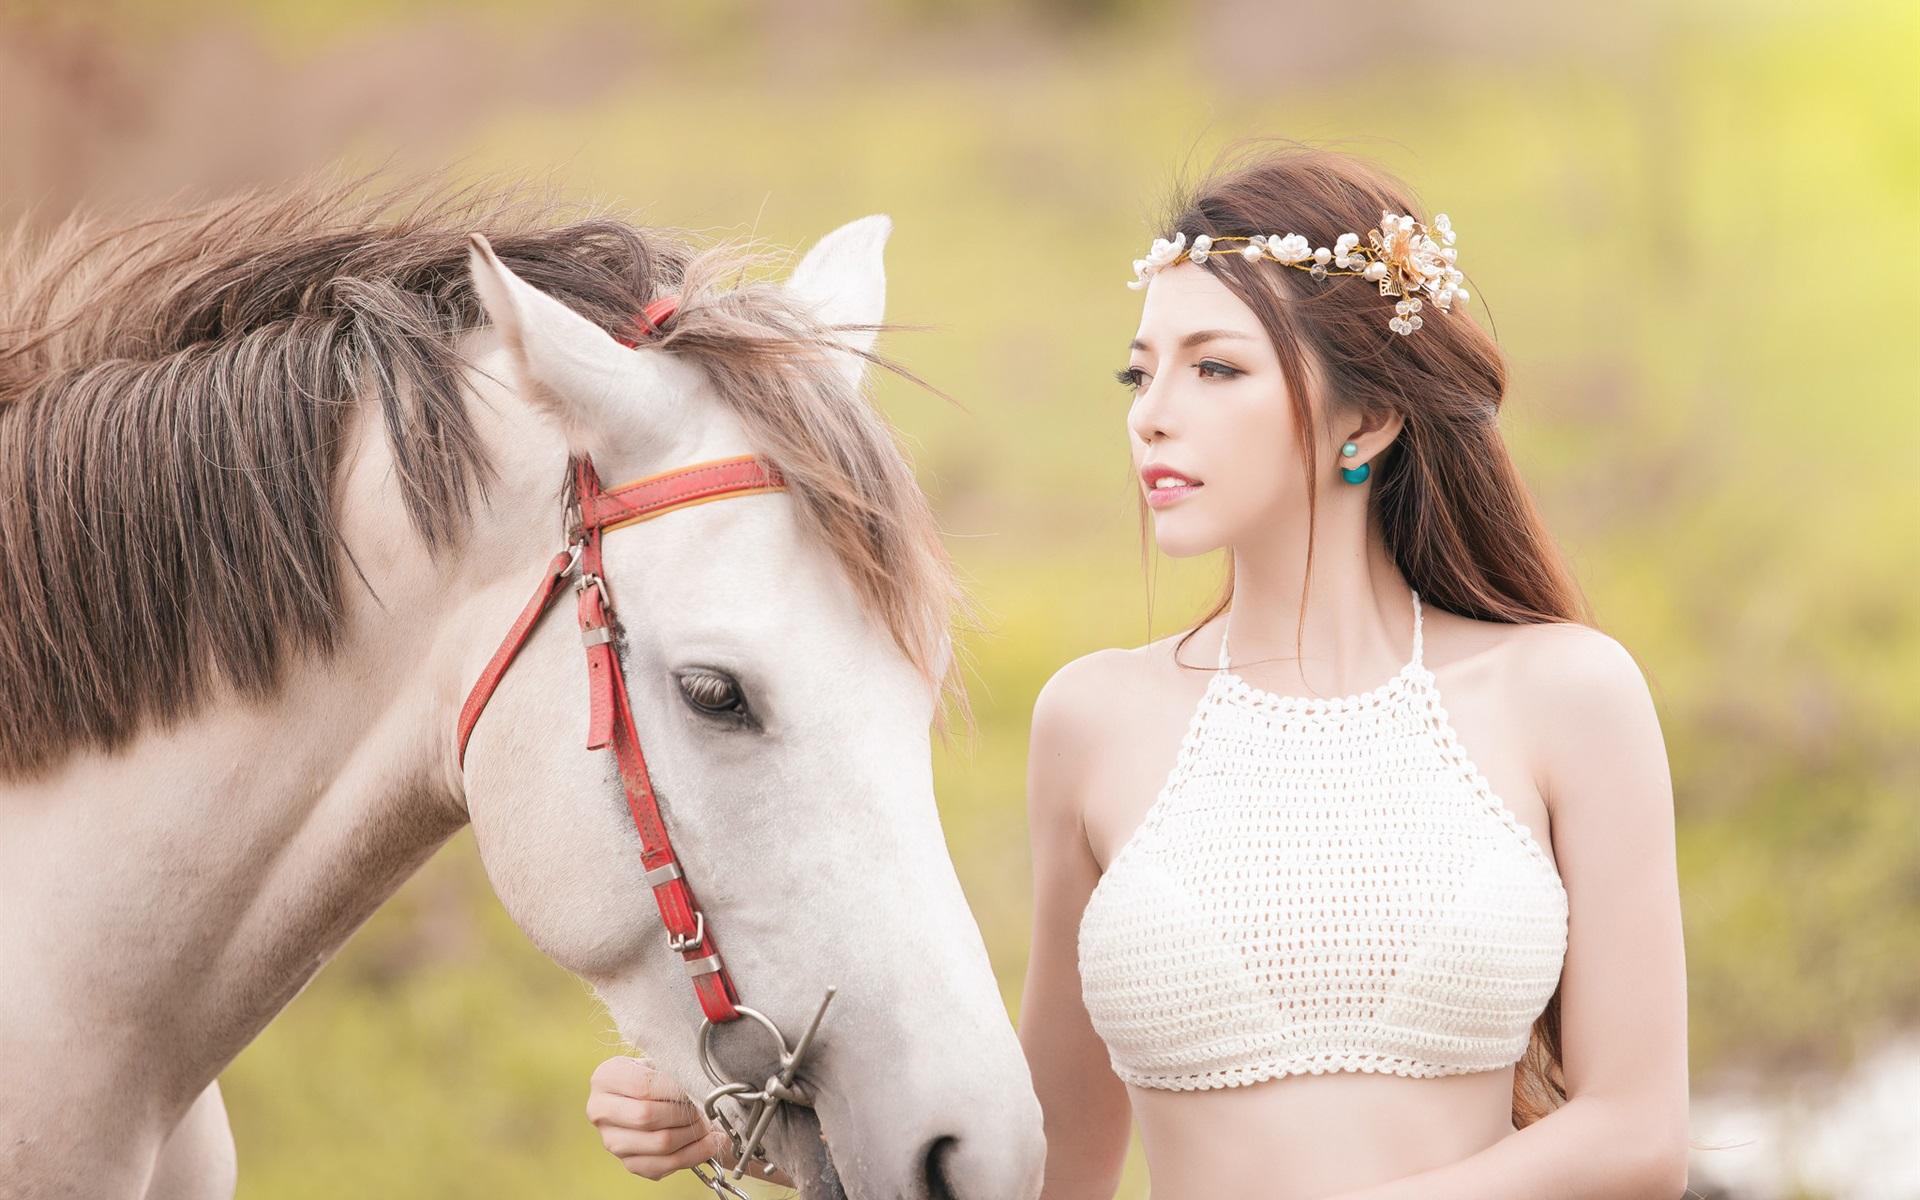 Wallpaper Beautiful Asian Girl And White Horse 1920x1200 Hd